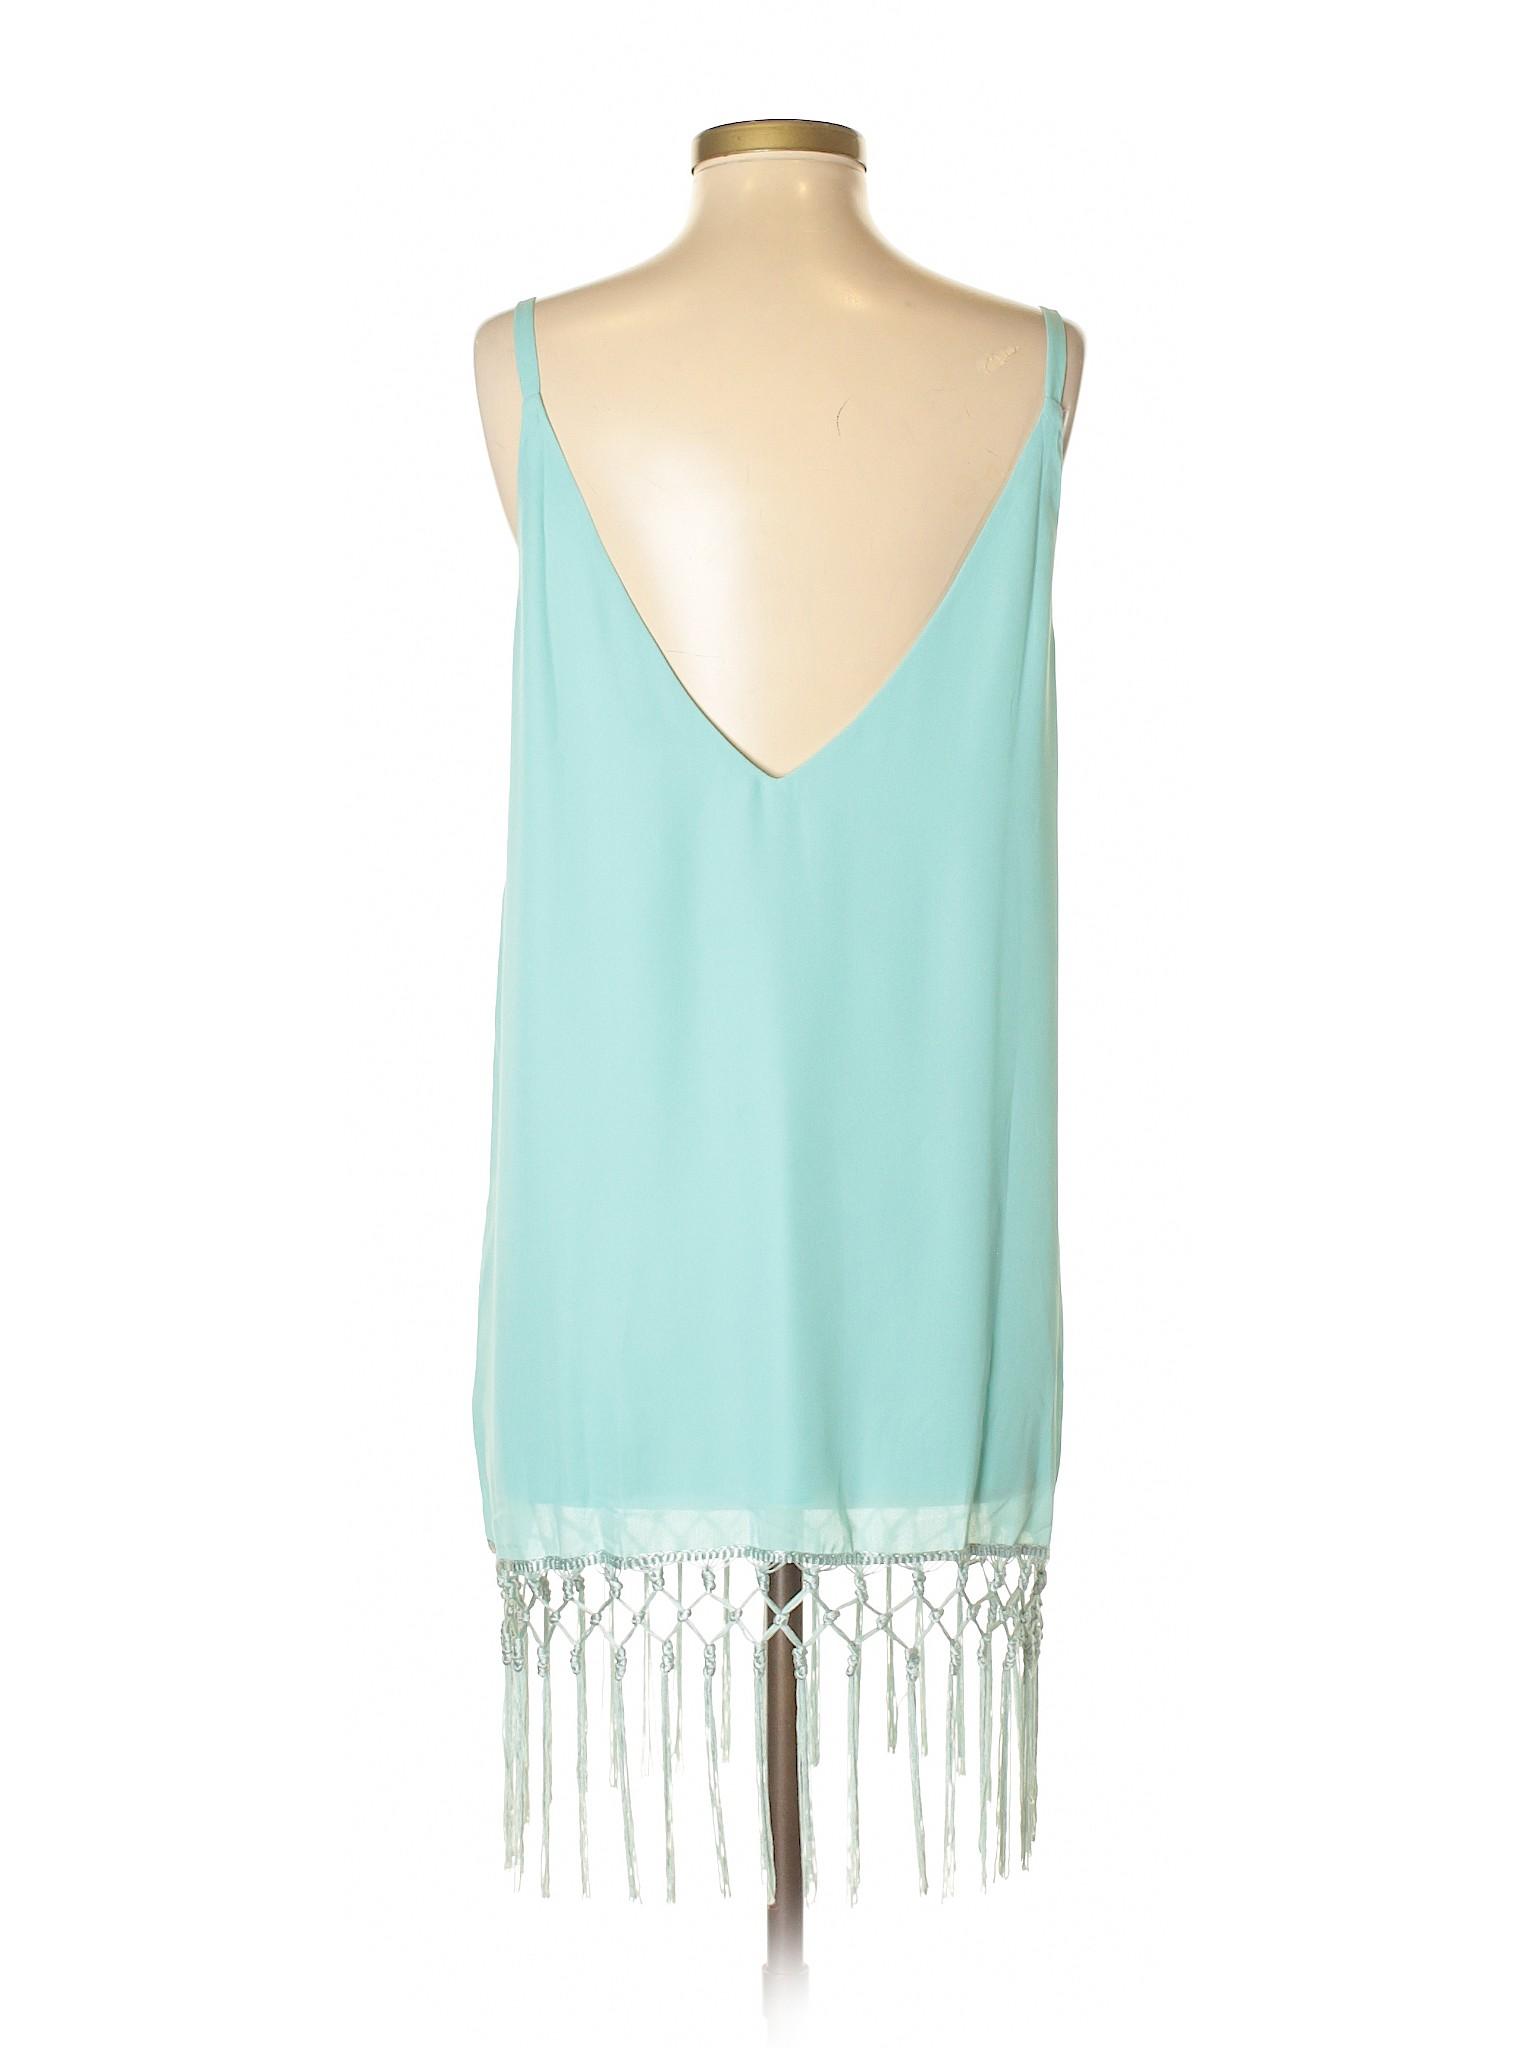 TOBI Boutique Casual Boutique Dress winter winter qxHtSOrx